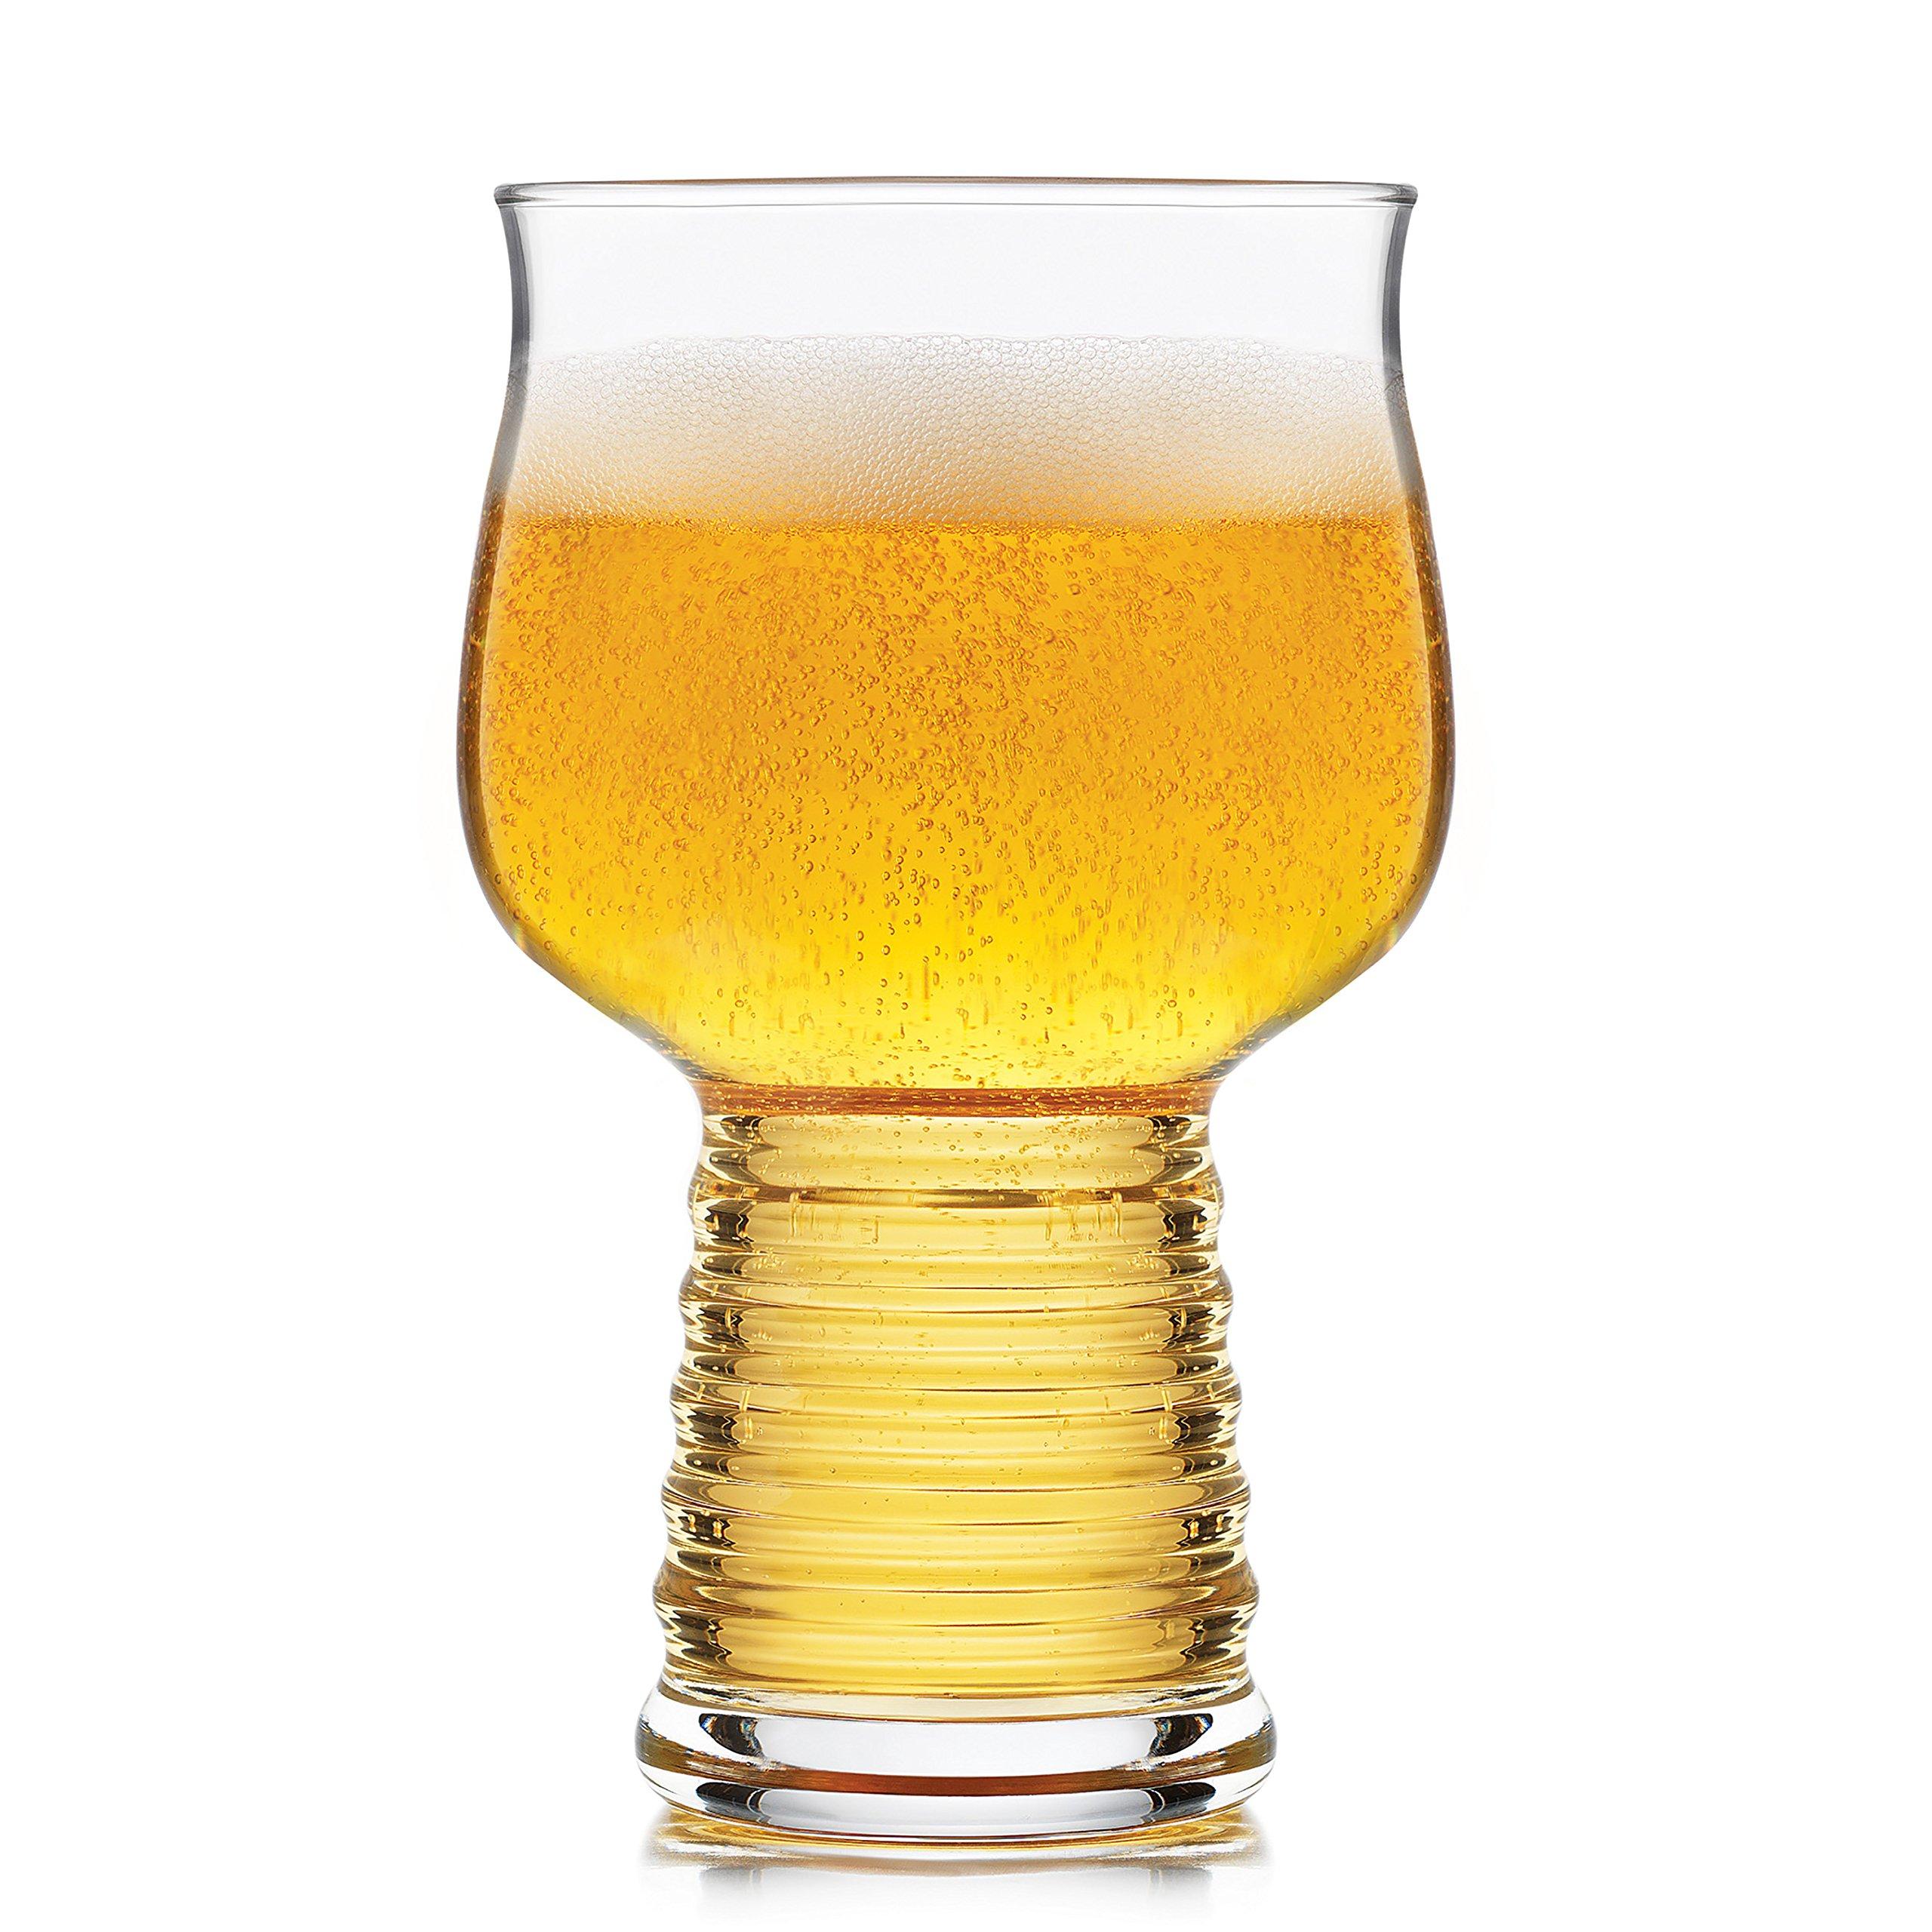 Libbey Craft Brews 4-piece Hard Cider Glass Set